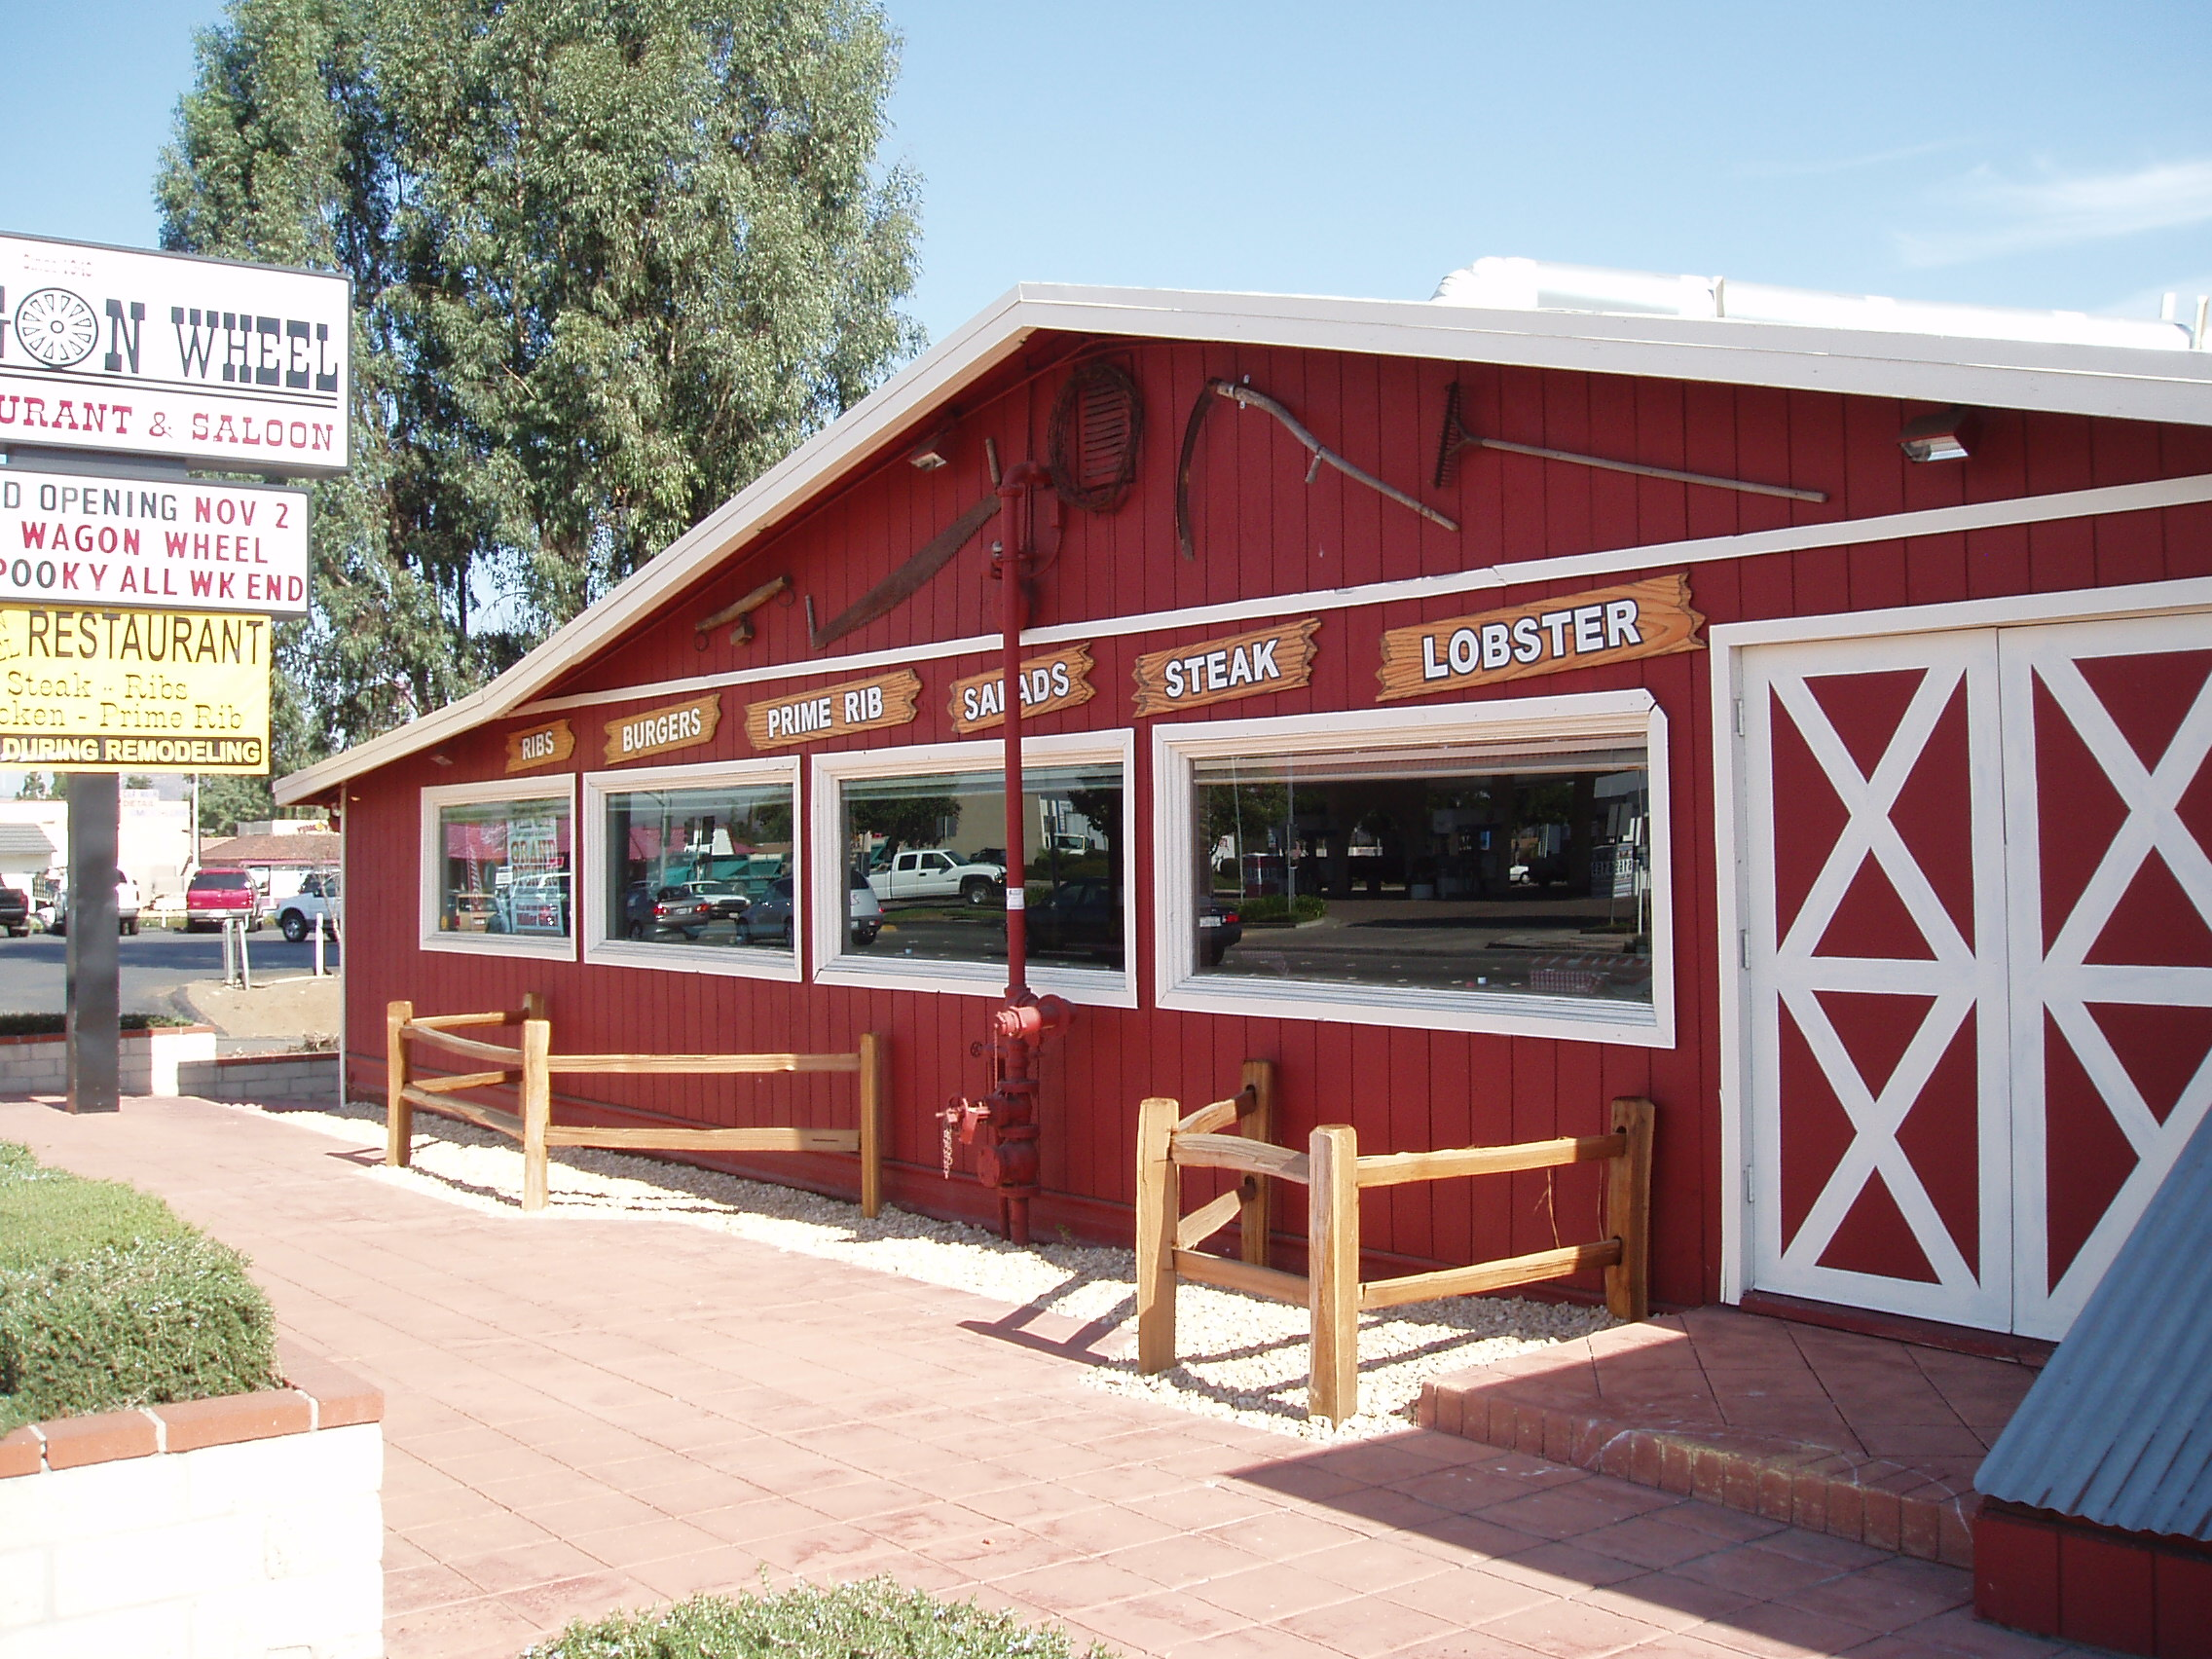 Western Mural Wagon Wheel Restaurant exterior Santee California 10.JPG